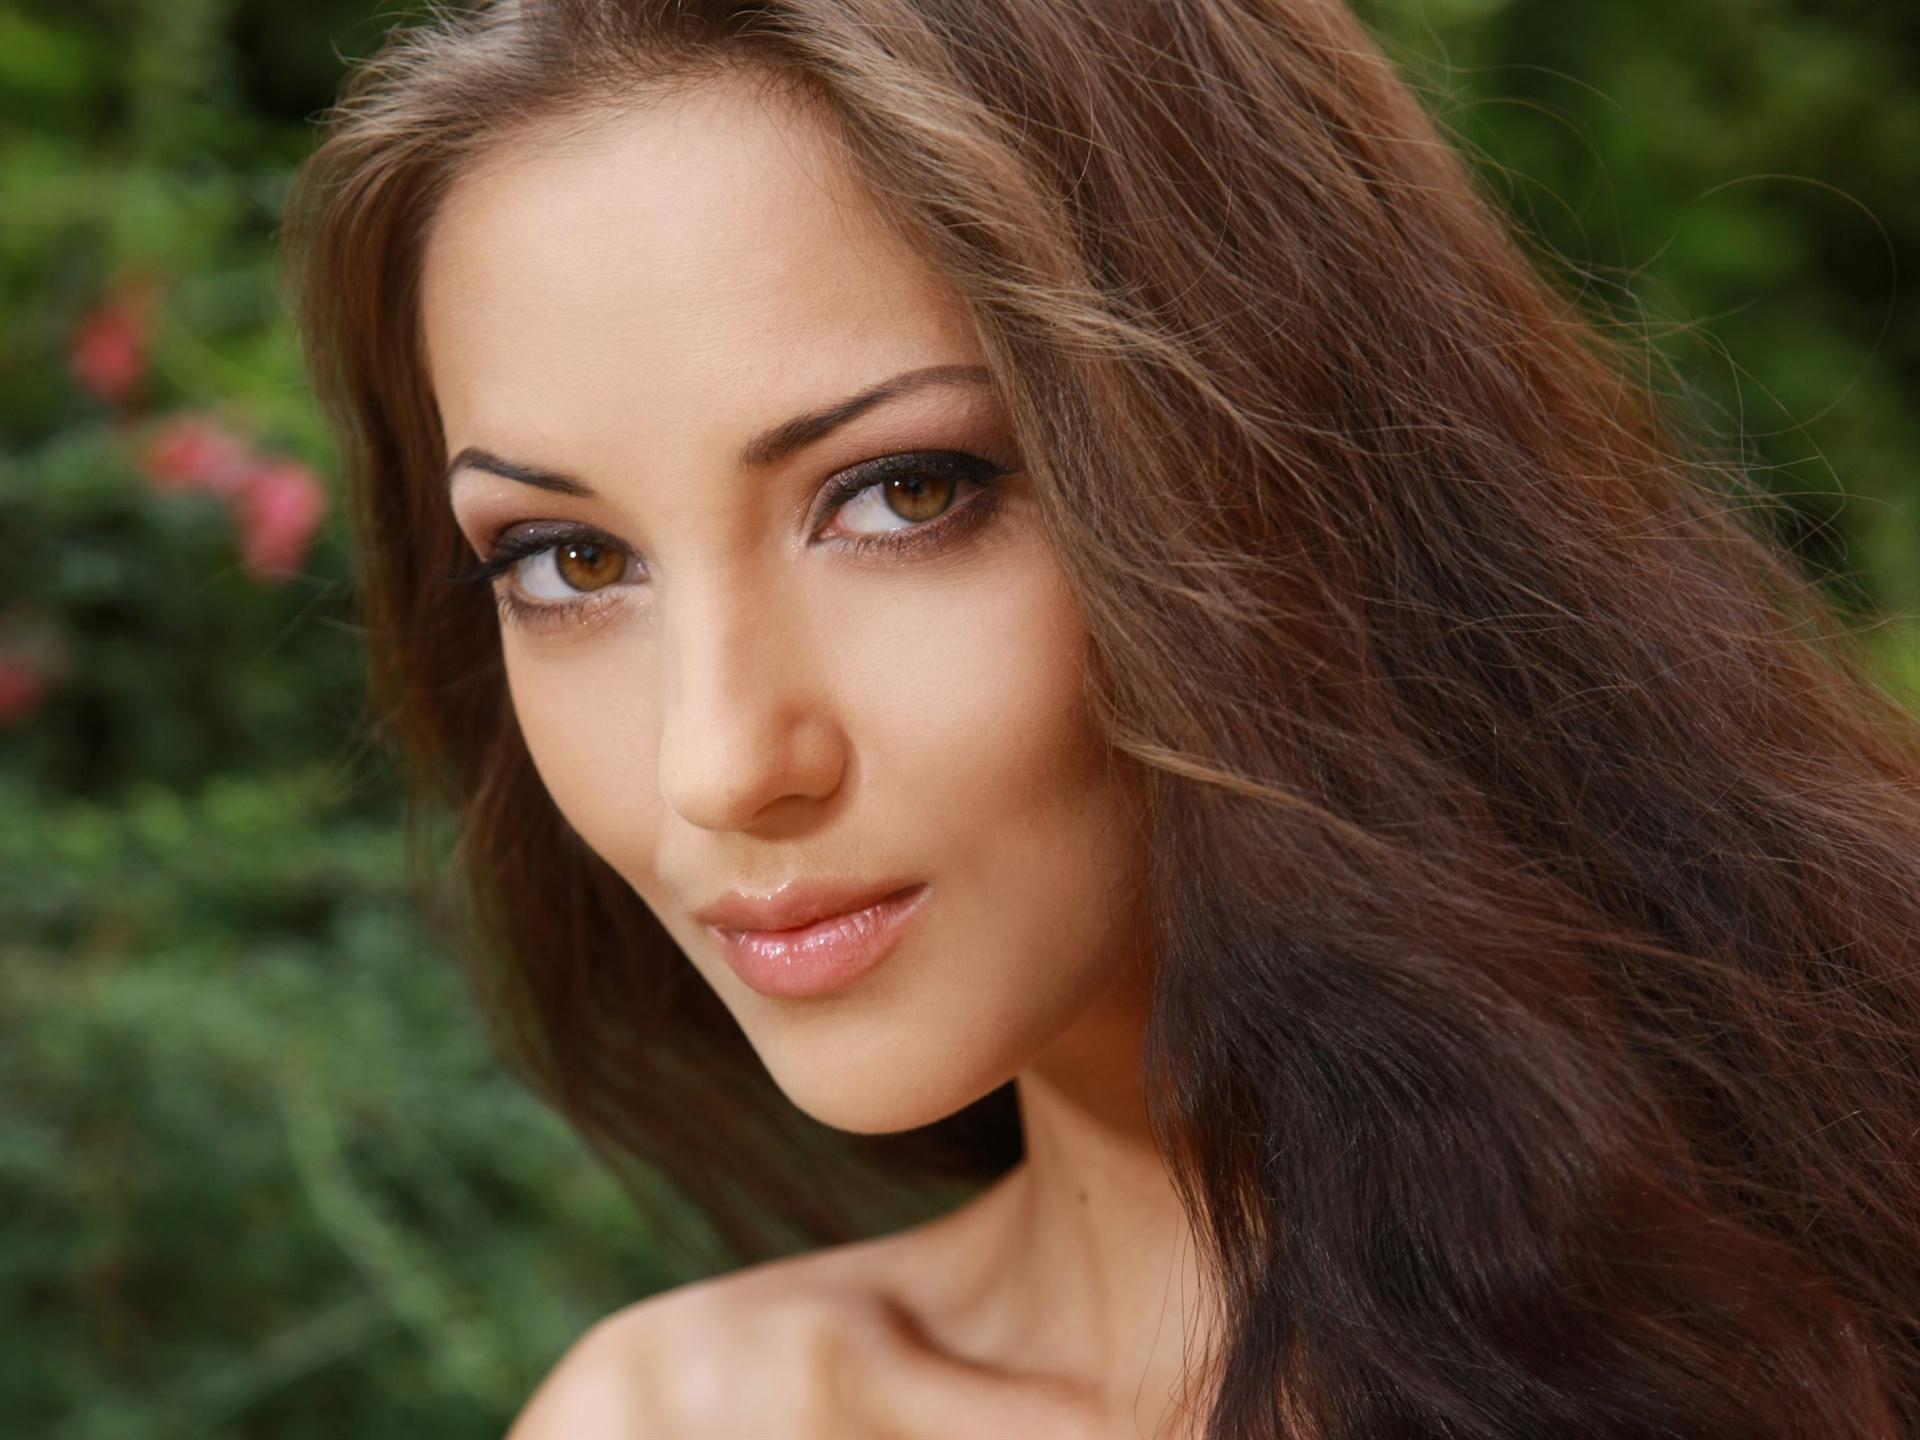 Anna Sbitnaya Pictures. Hotness Rating = 9.19/10